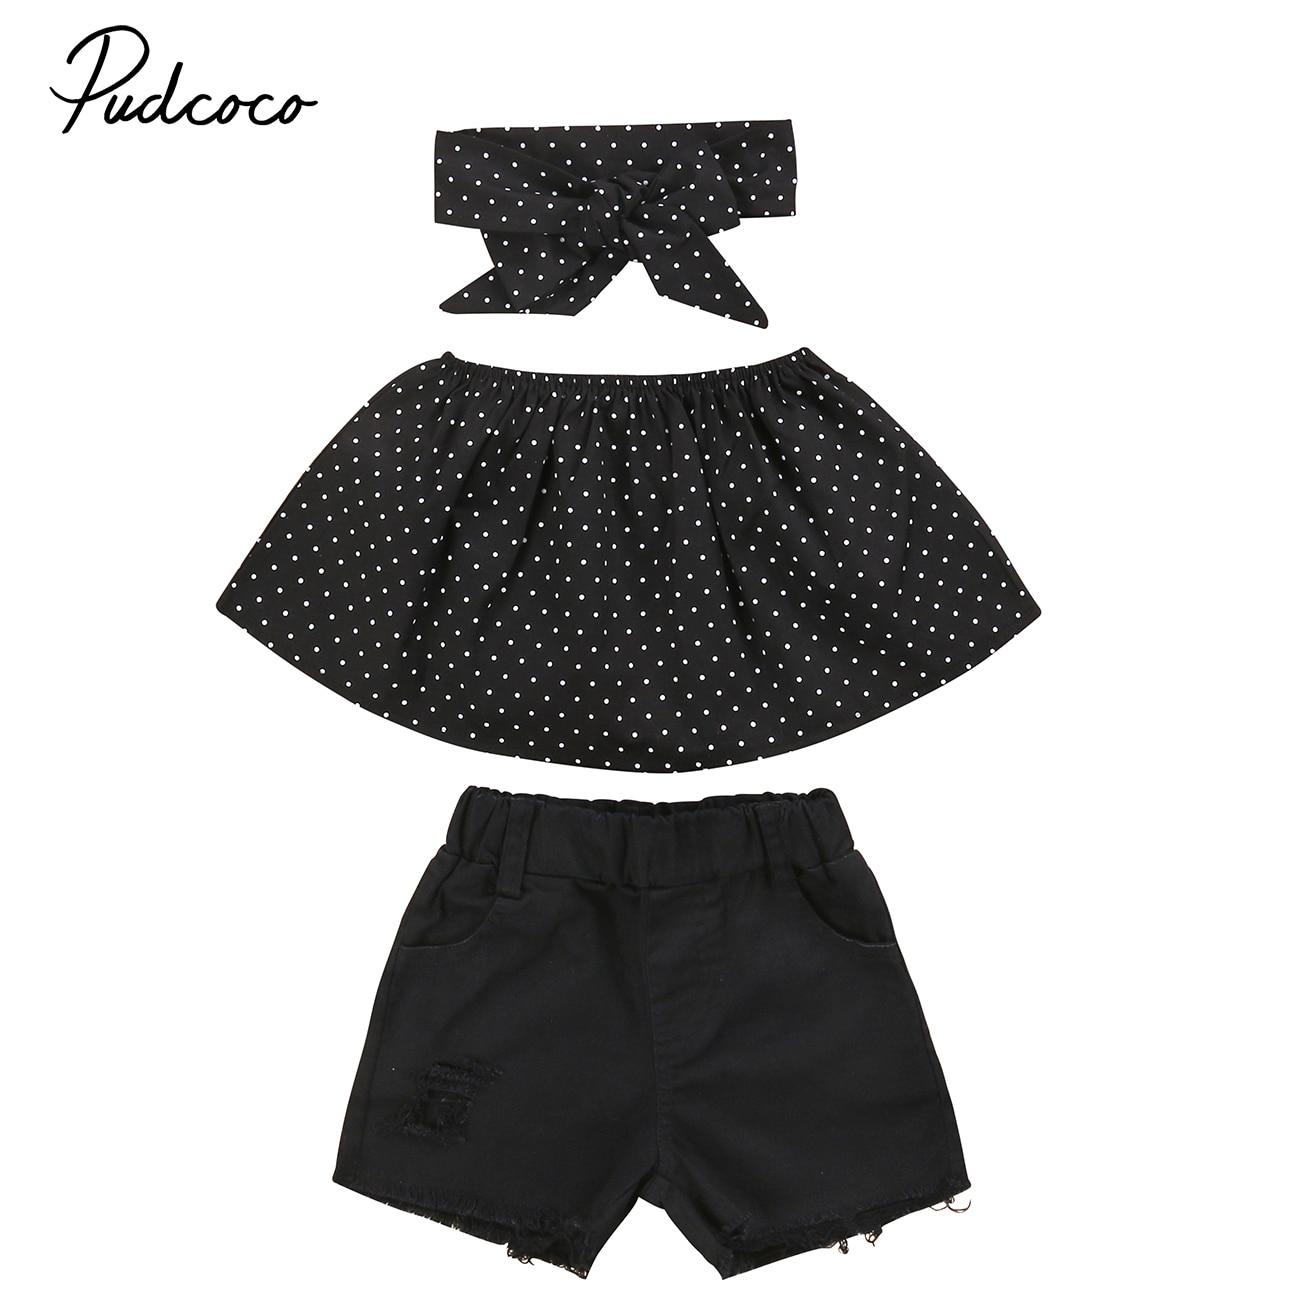 3pcs Kids Girl Off Shoulder Dot Tops Hot Pants Bowknot Headband Outfits Set Clothes Girls Summer Black Clothing 1-6Y